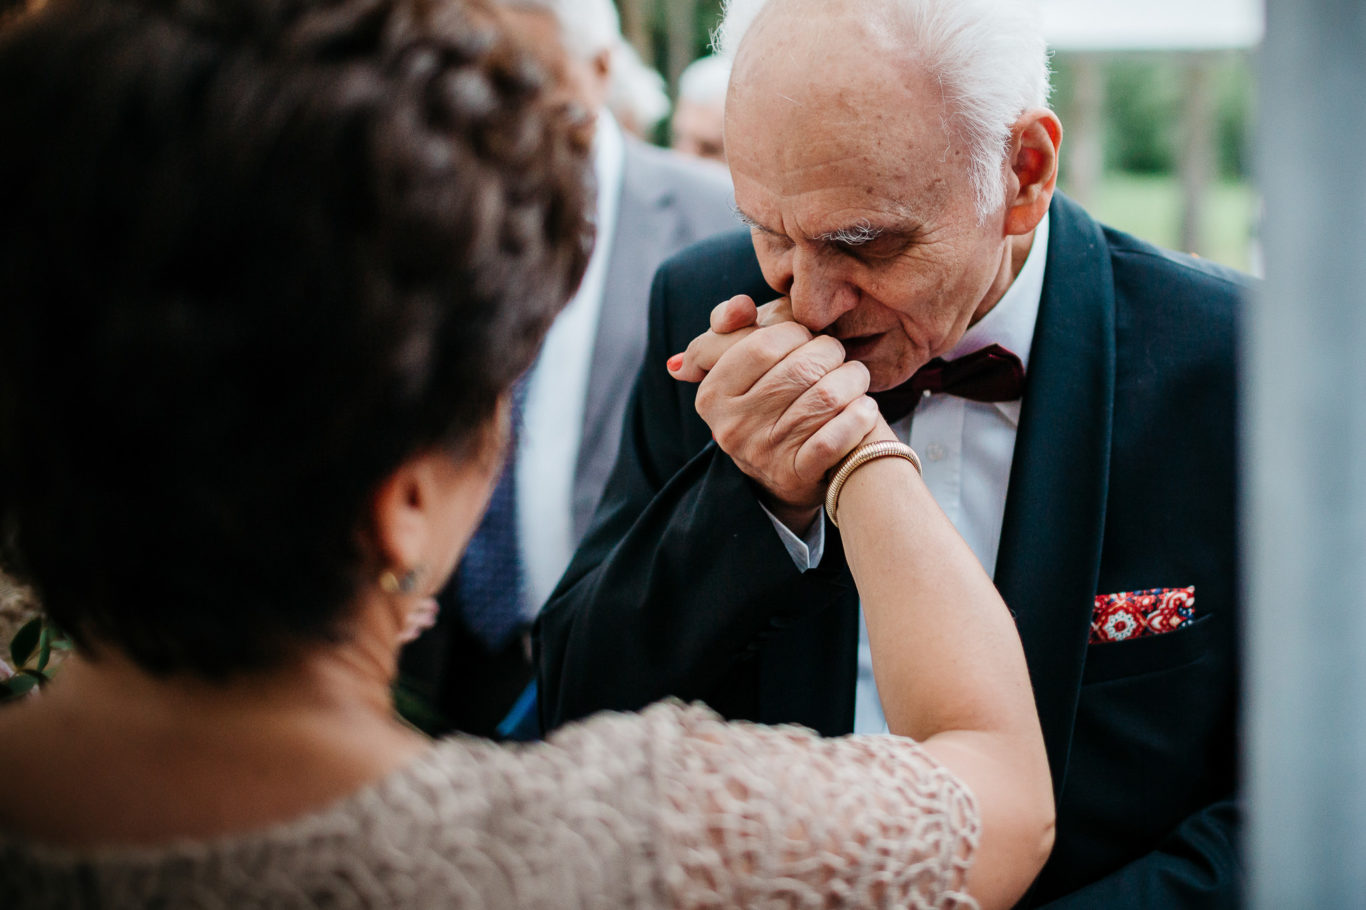 0432-Fotografie-nunta-Stirbey-Laura-Rares-fotograf-Ciprian-Dumitrescu-CDF_0579